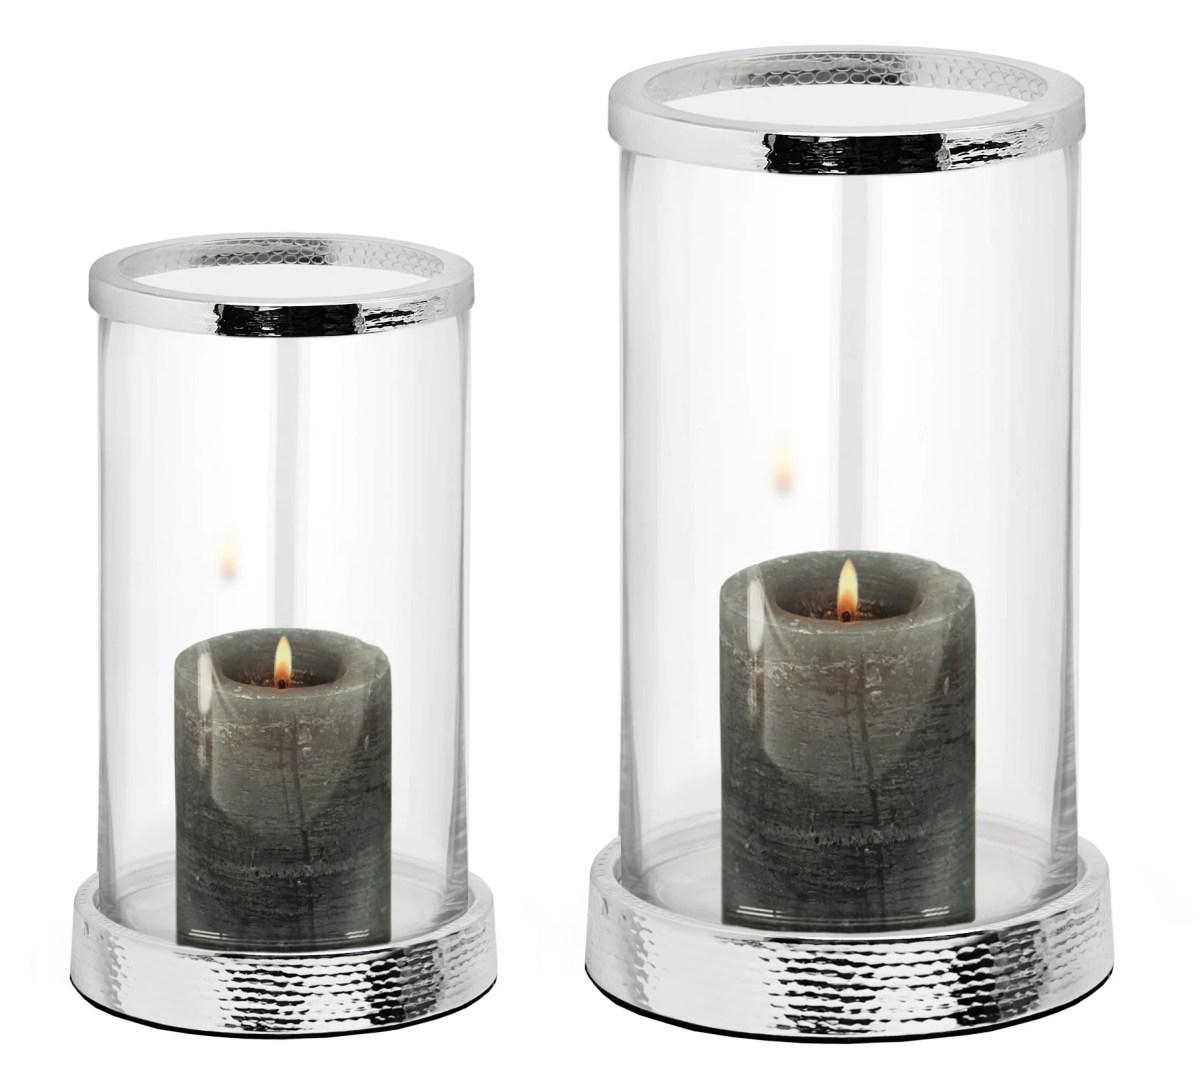 2844 Edzard Windlicht Kerzenhalter Glas Edel Versilbert f. Stumpenkerze Kerze silber